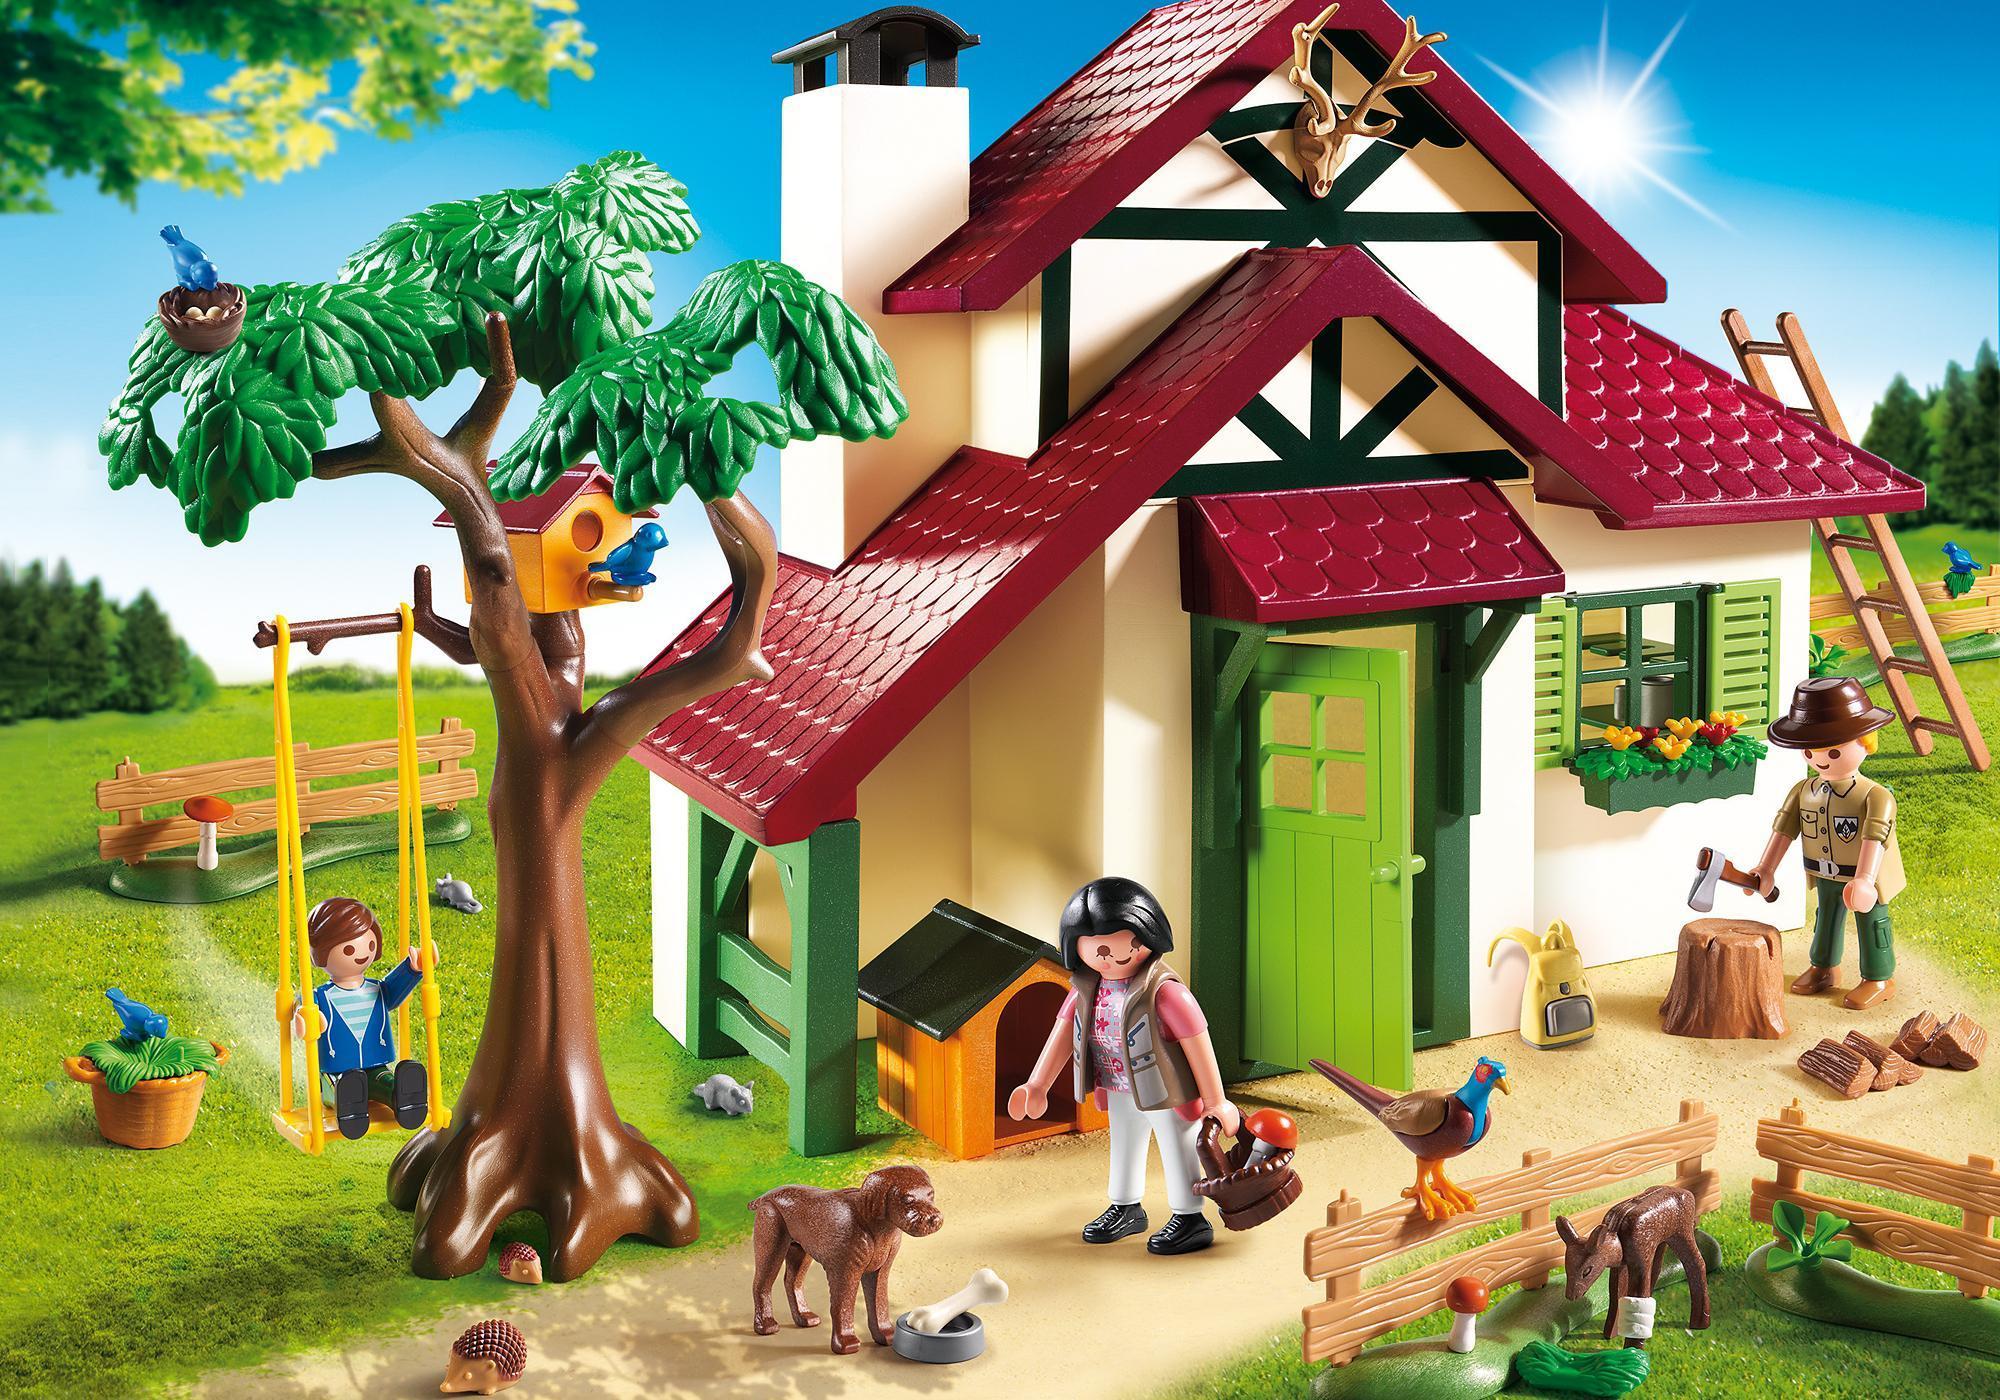 http://media.playmobil.com/i/playmobil/6811_product_detail/Καλύβα δασοφύλακα